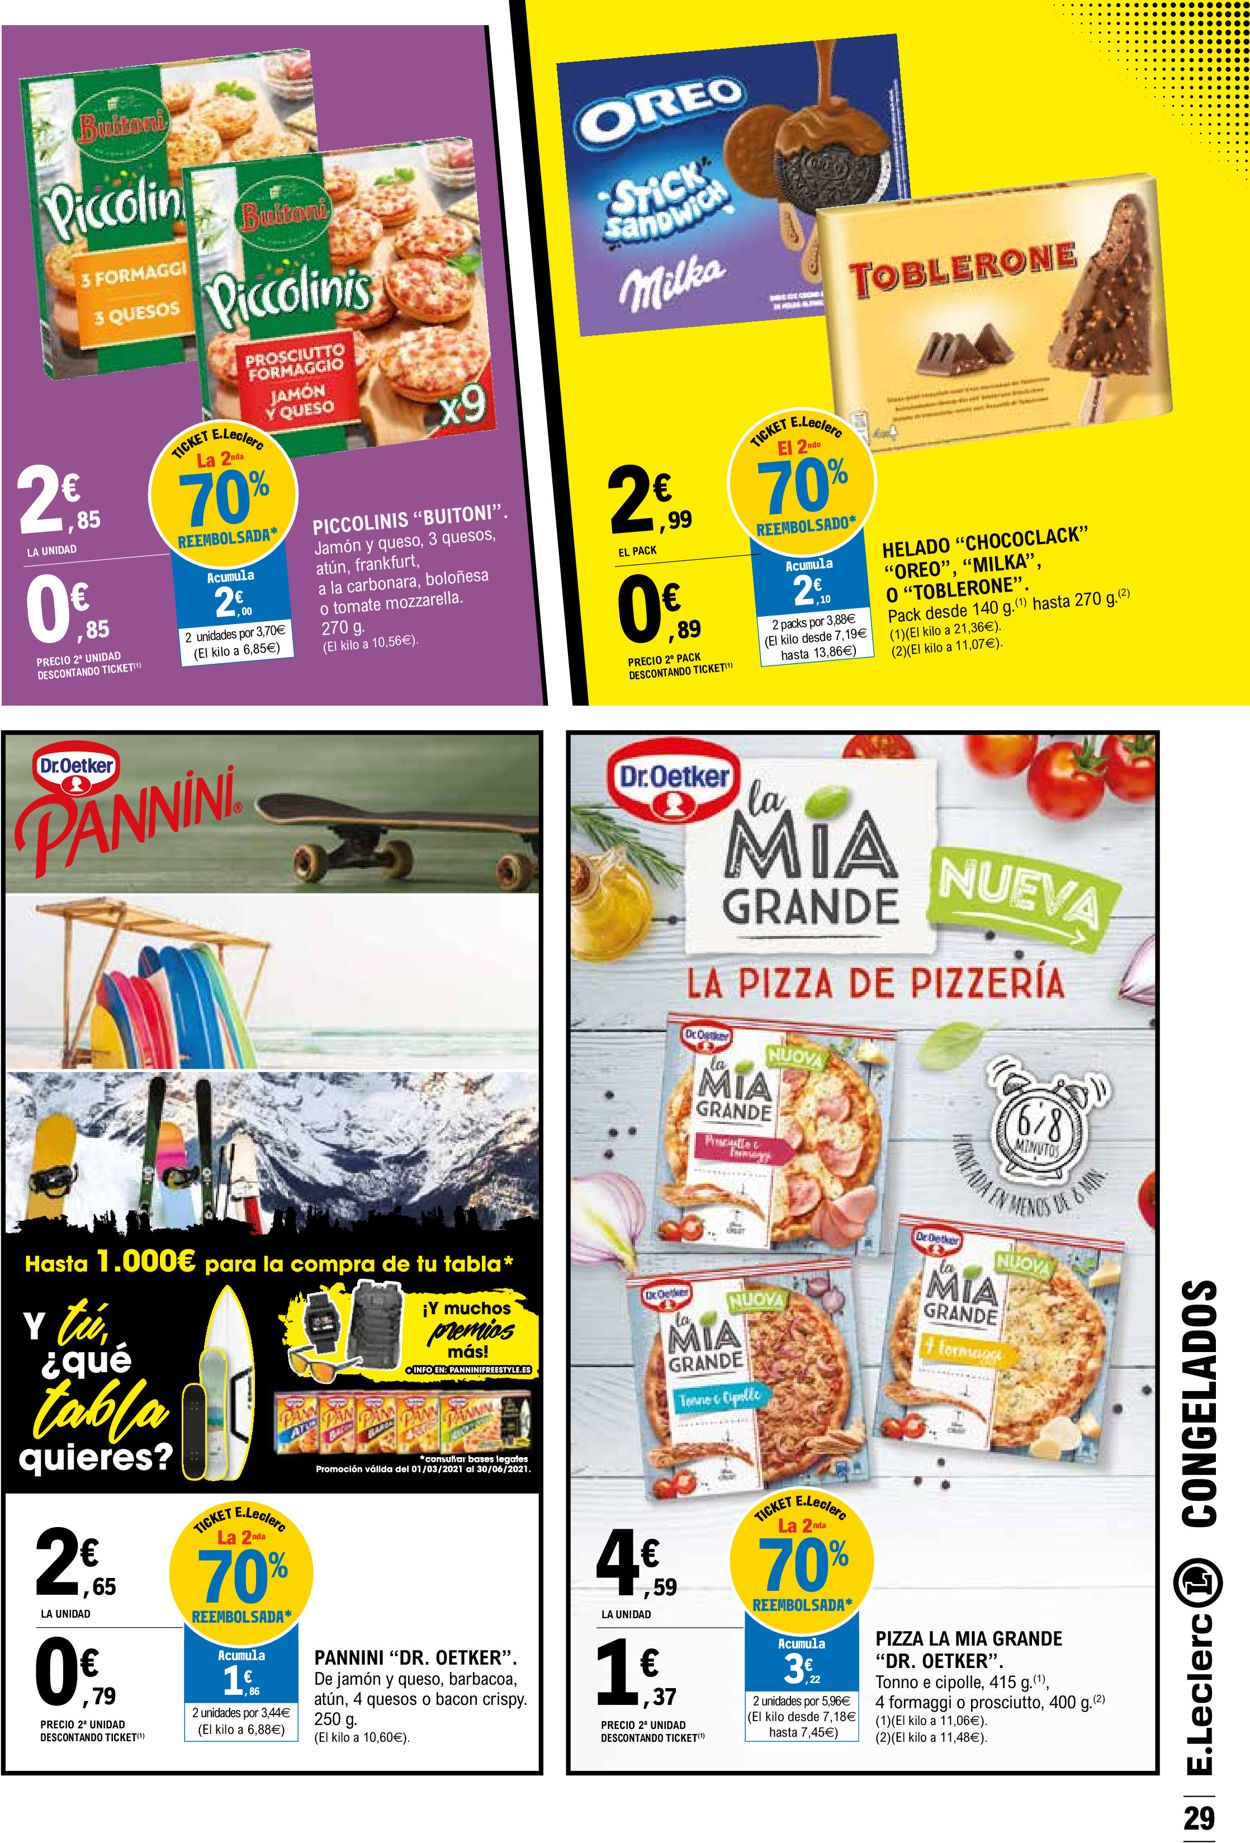 E.leclerc Folleto - 03.03-14.03.2021 (Página 29)